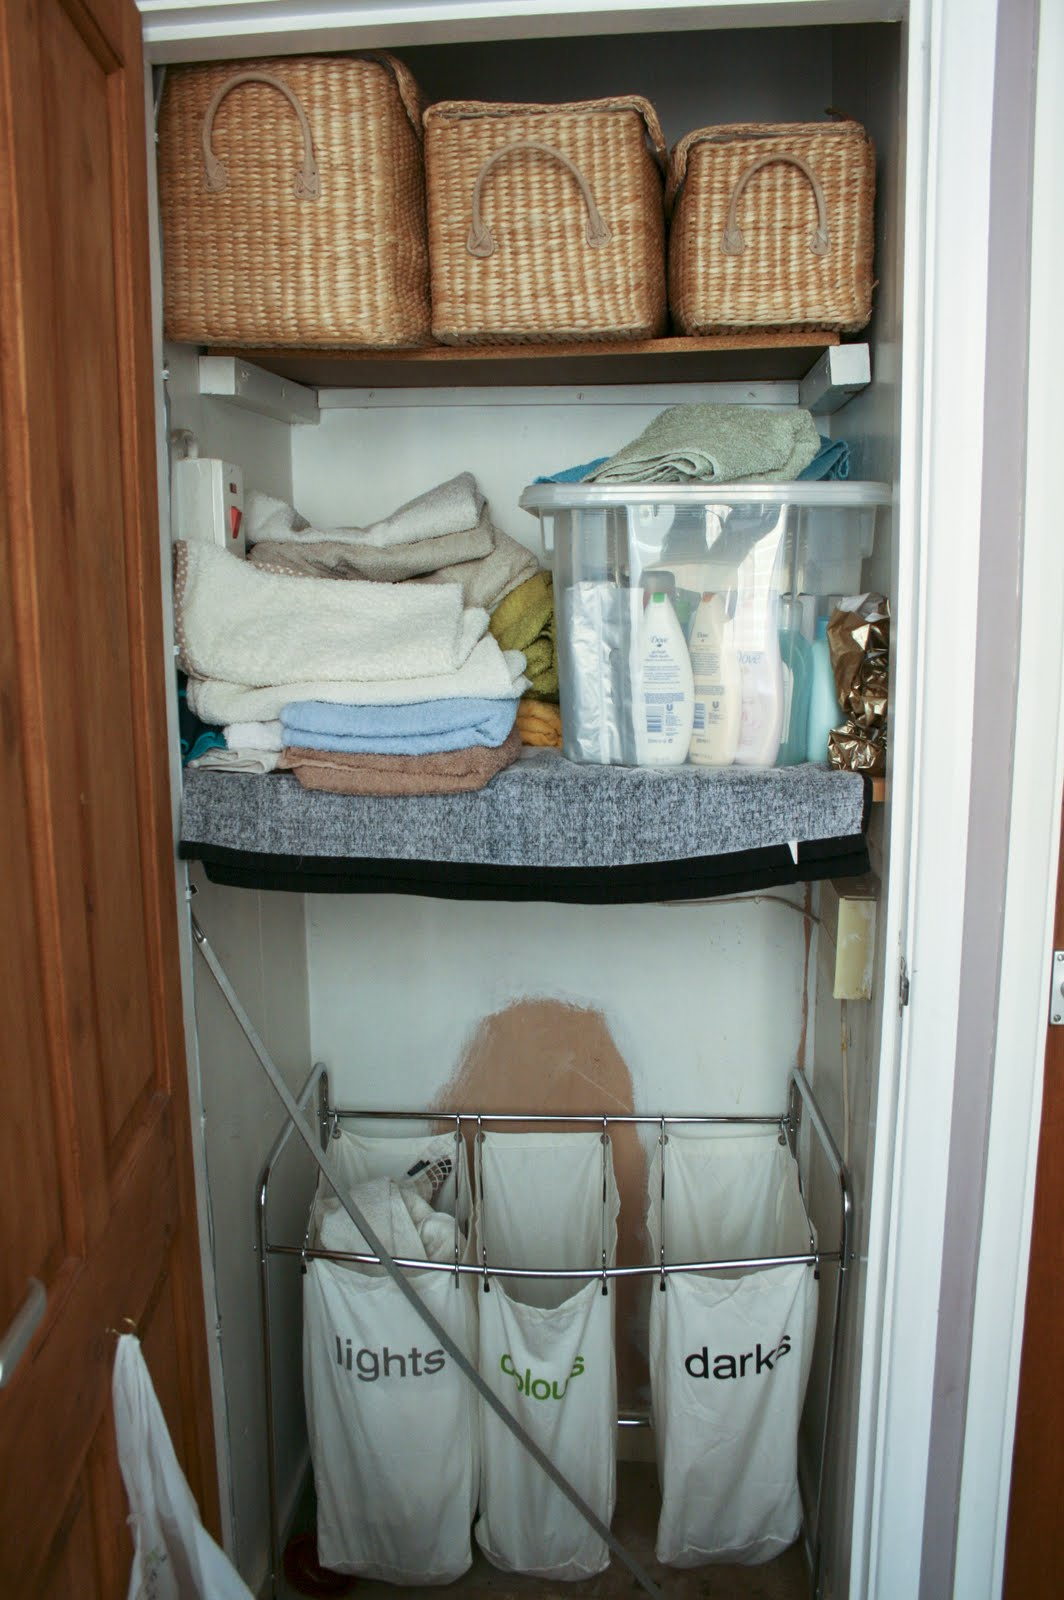 airing cupboard designs photo - 5